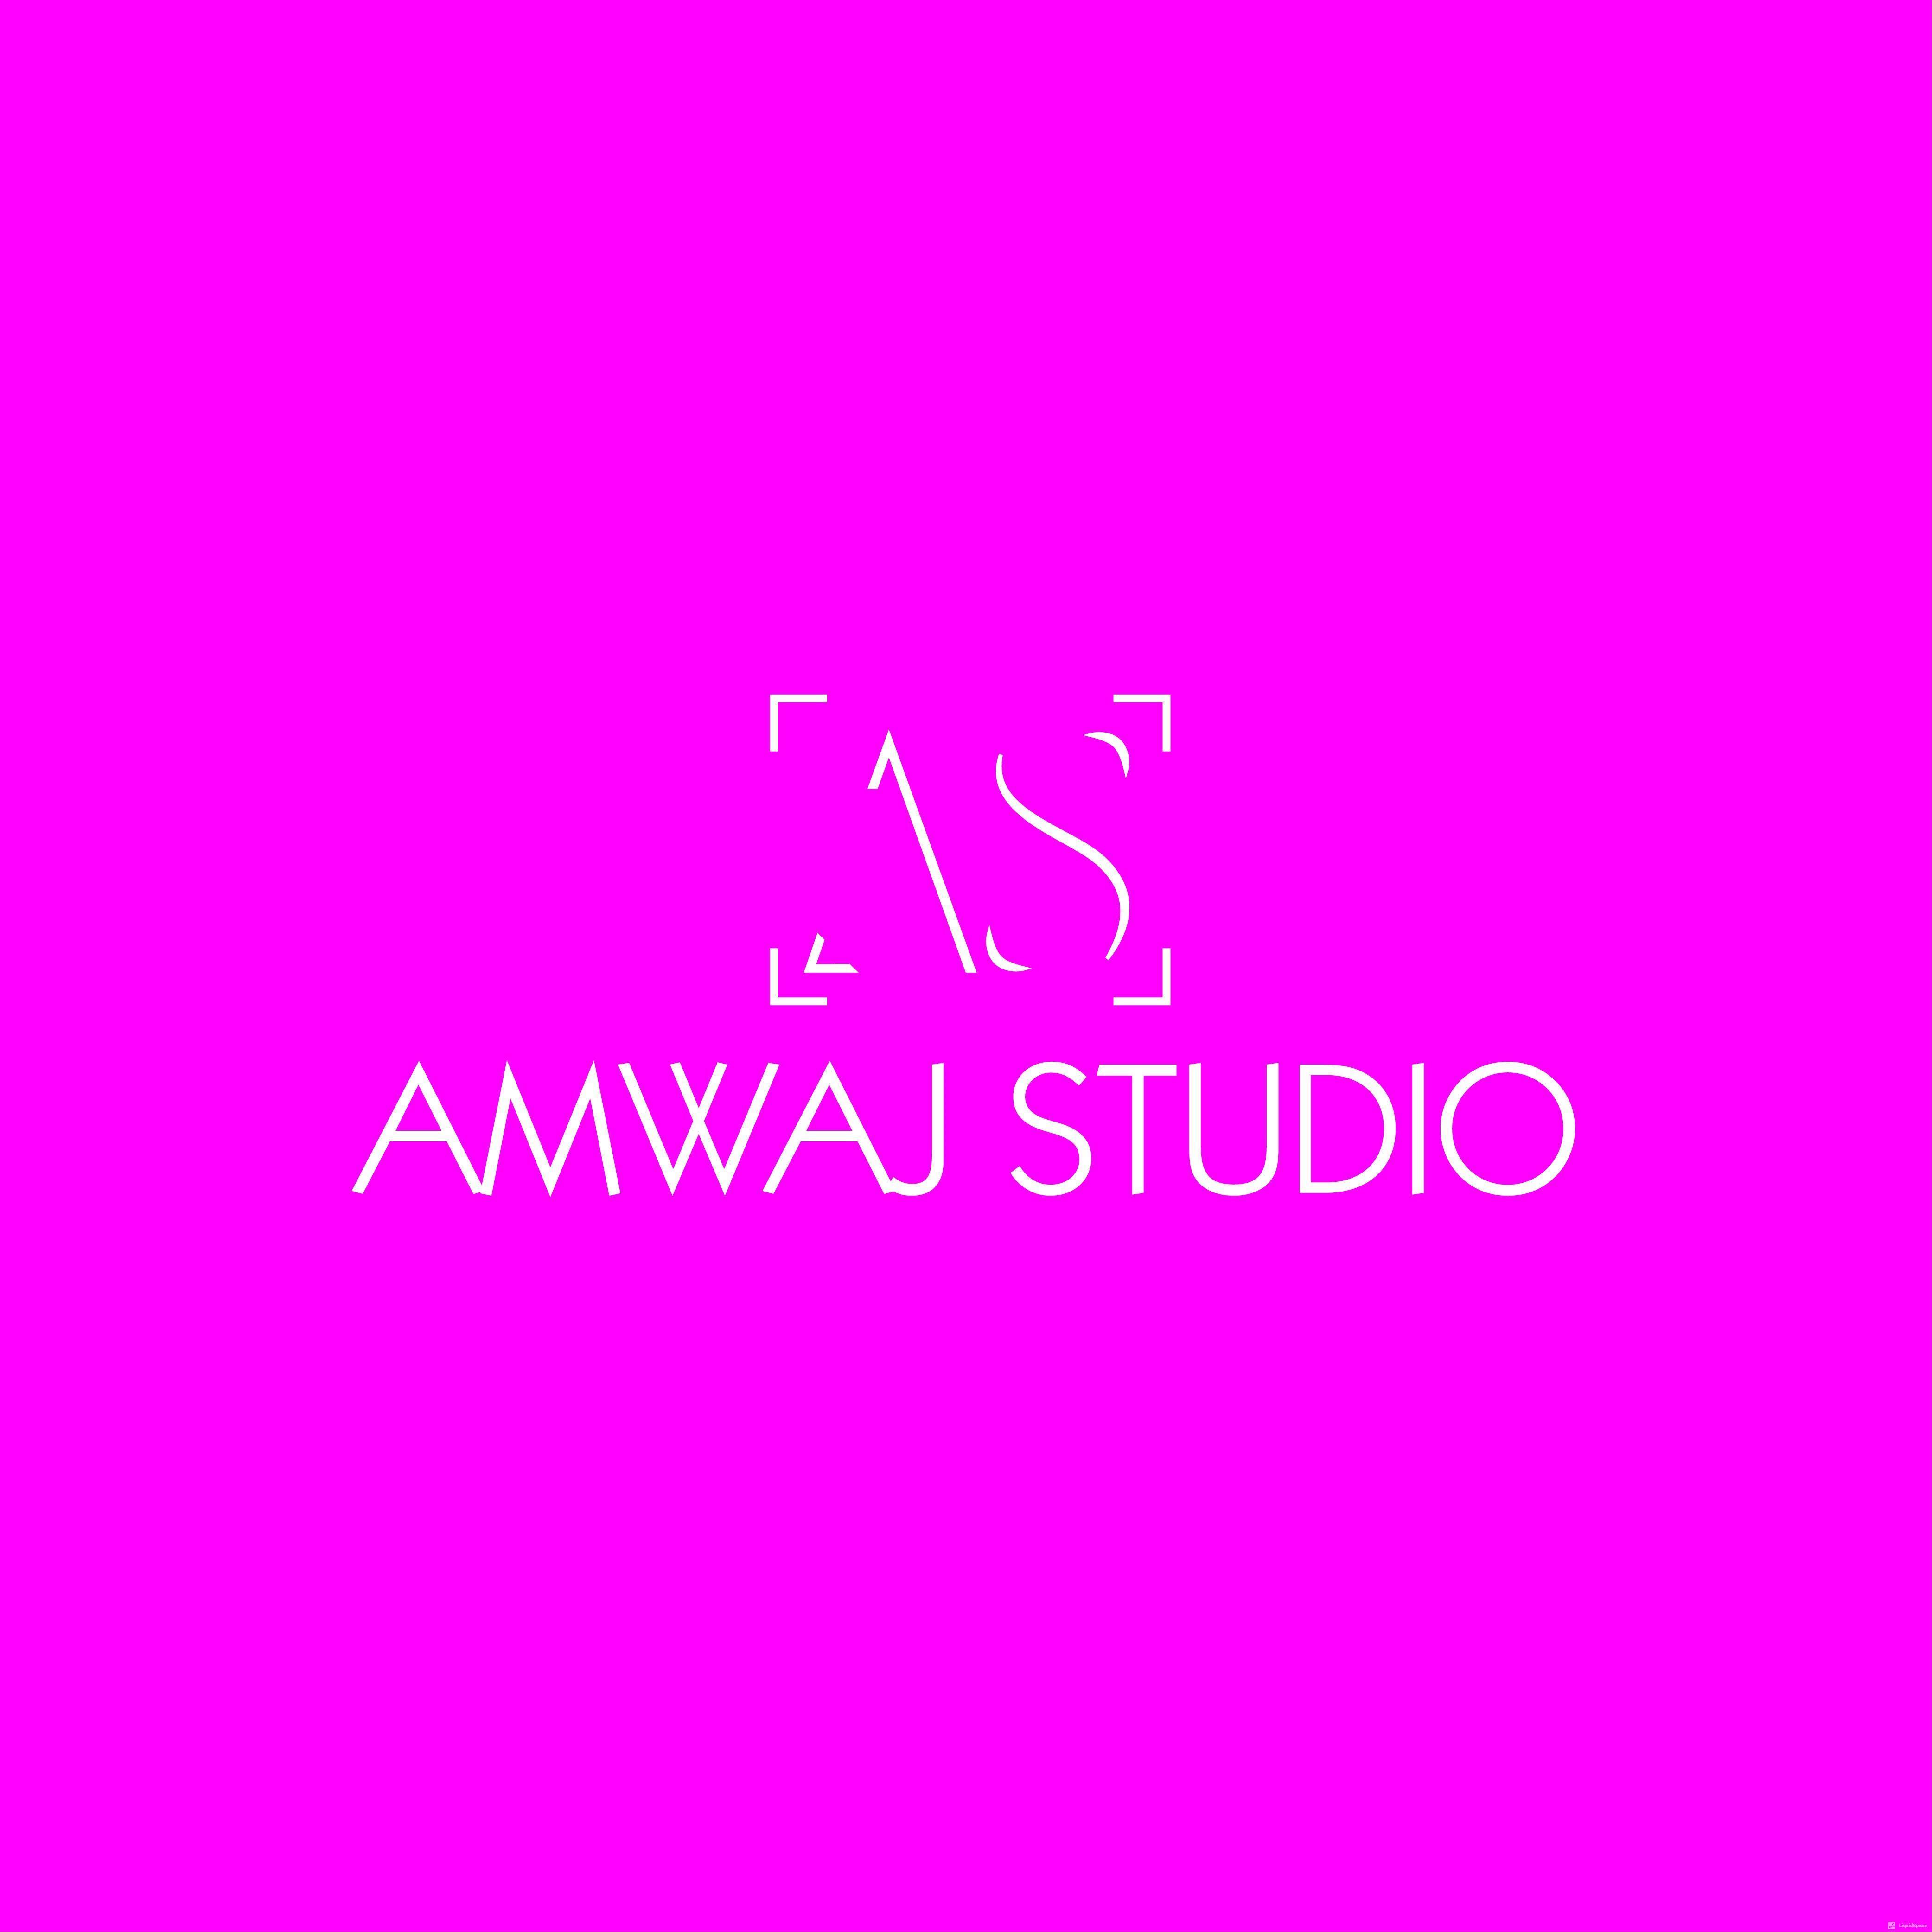 Logo of Amwaj Studio